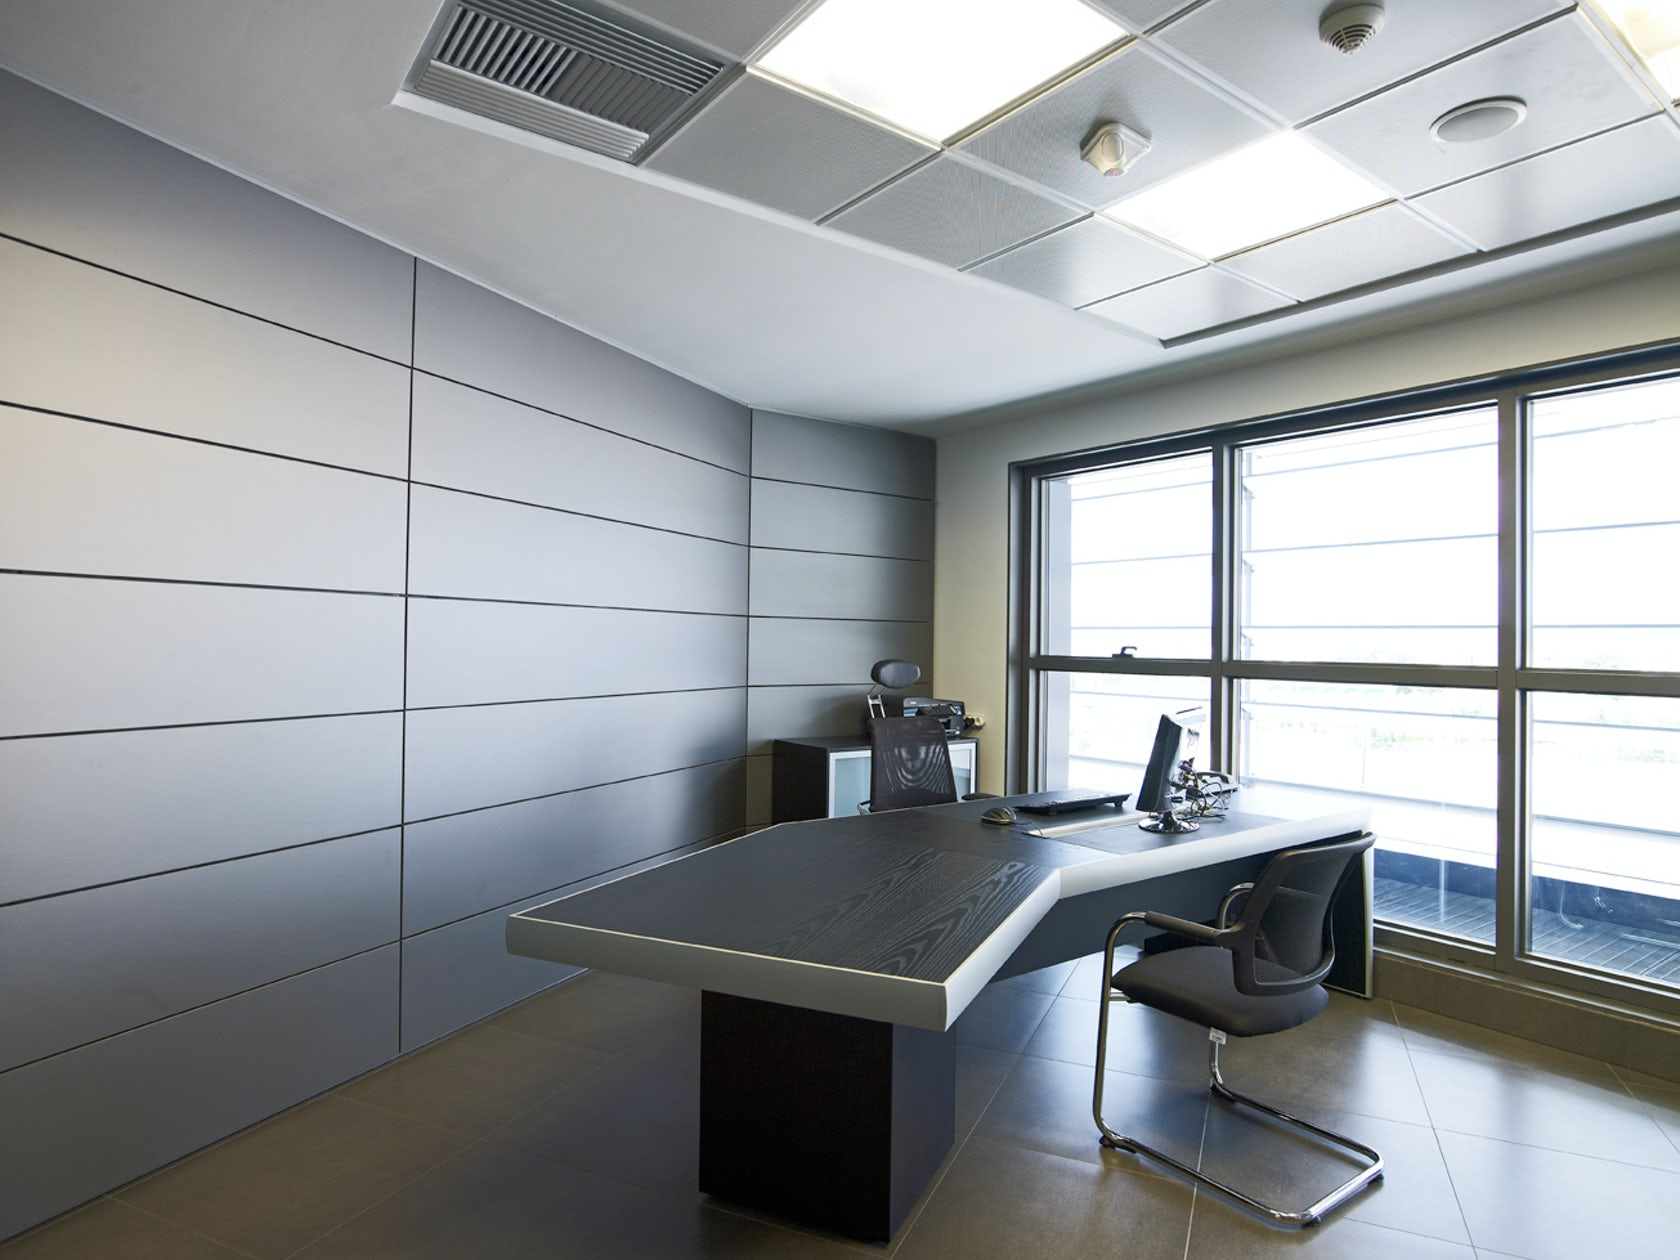 Office Storage Building : Office storage building architizer